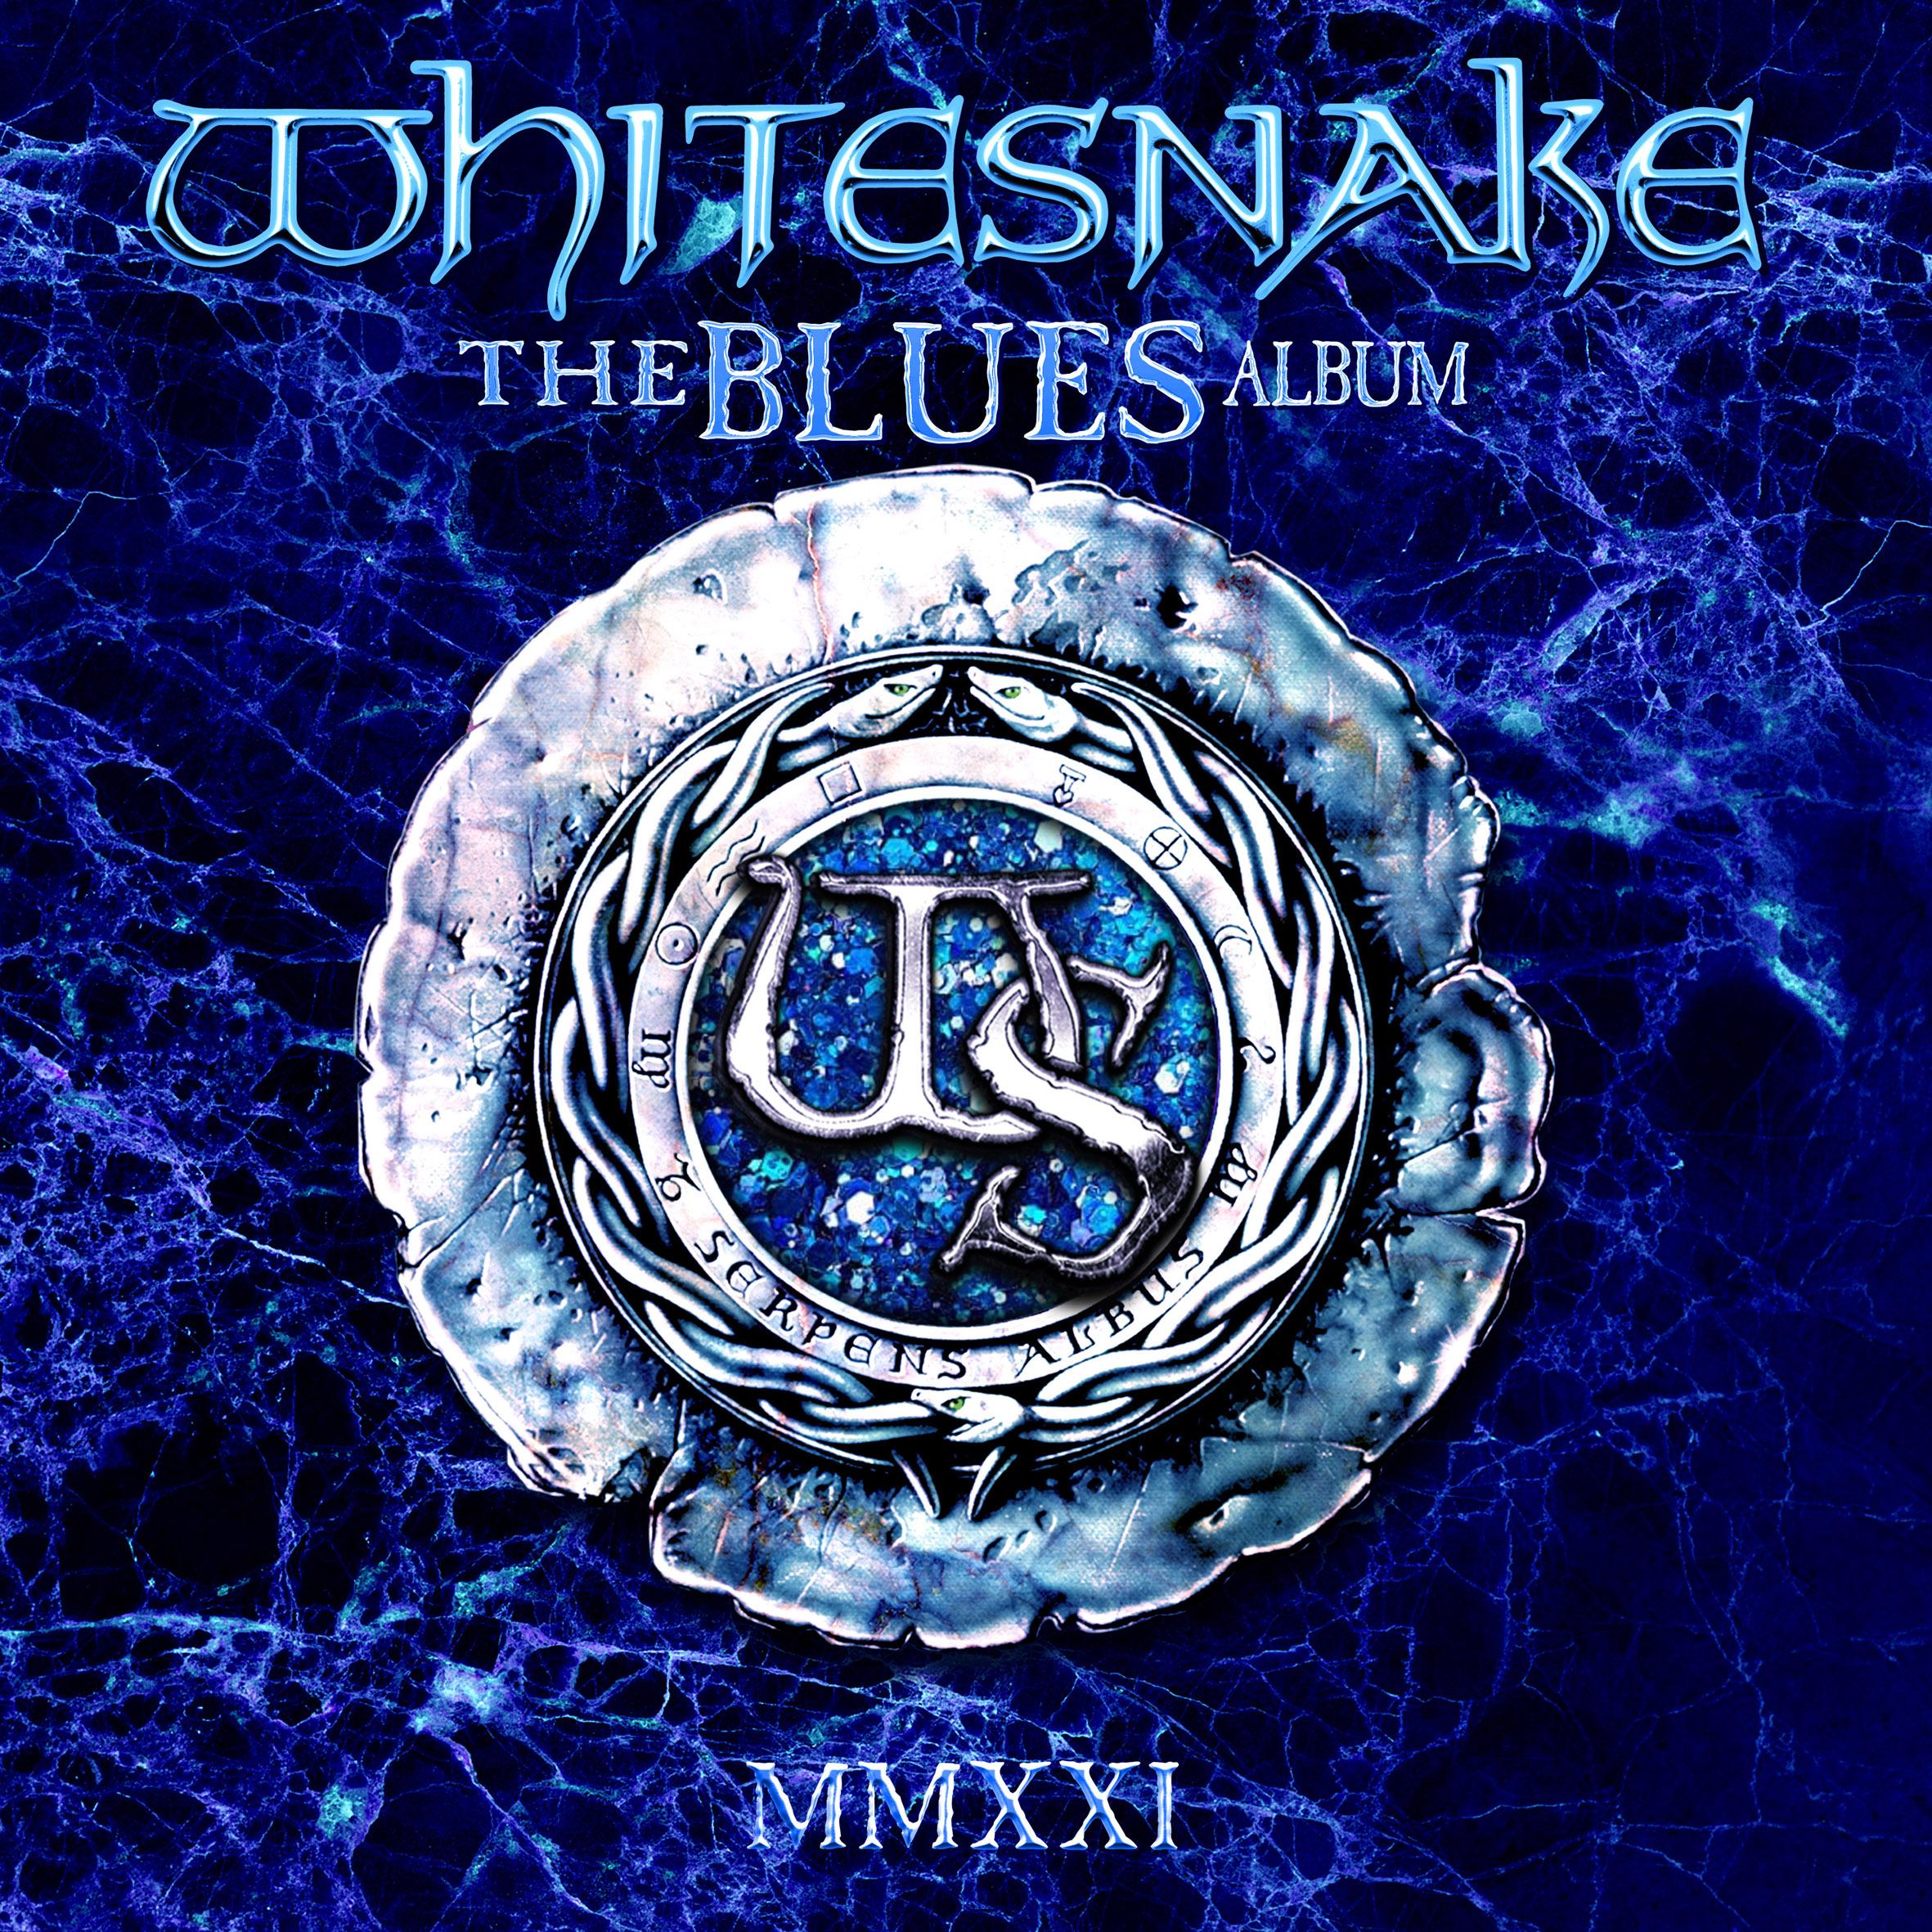 Whitesnake издават колекцията The blues album 26